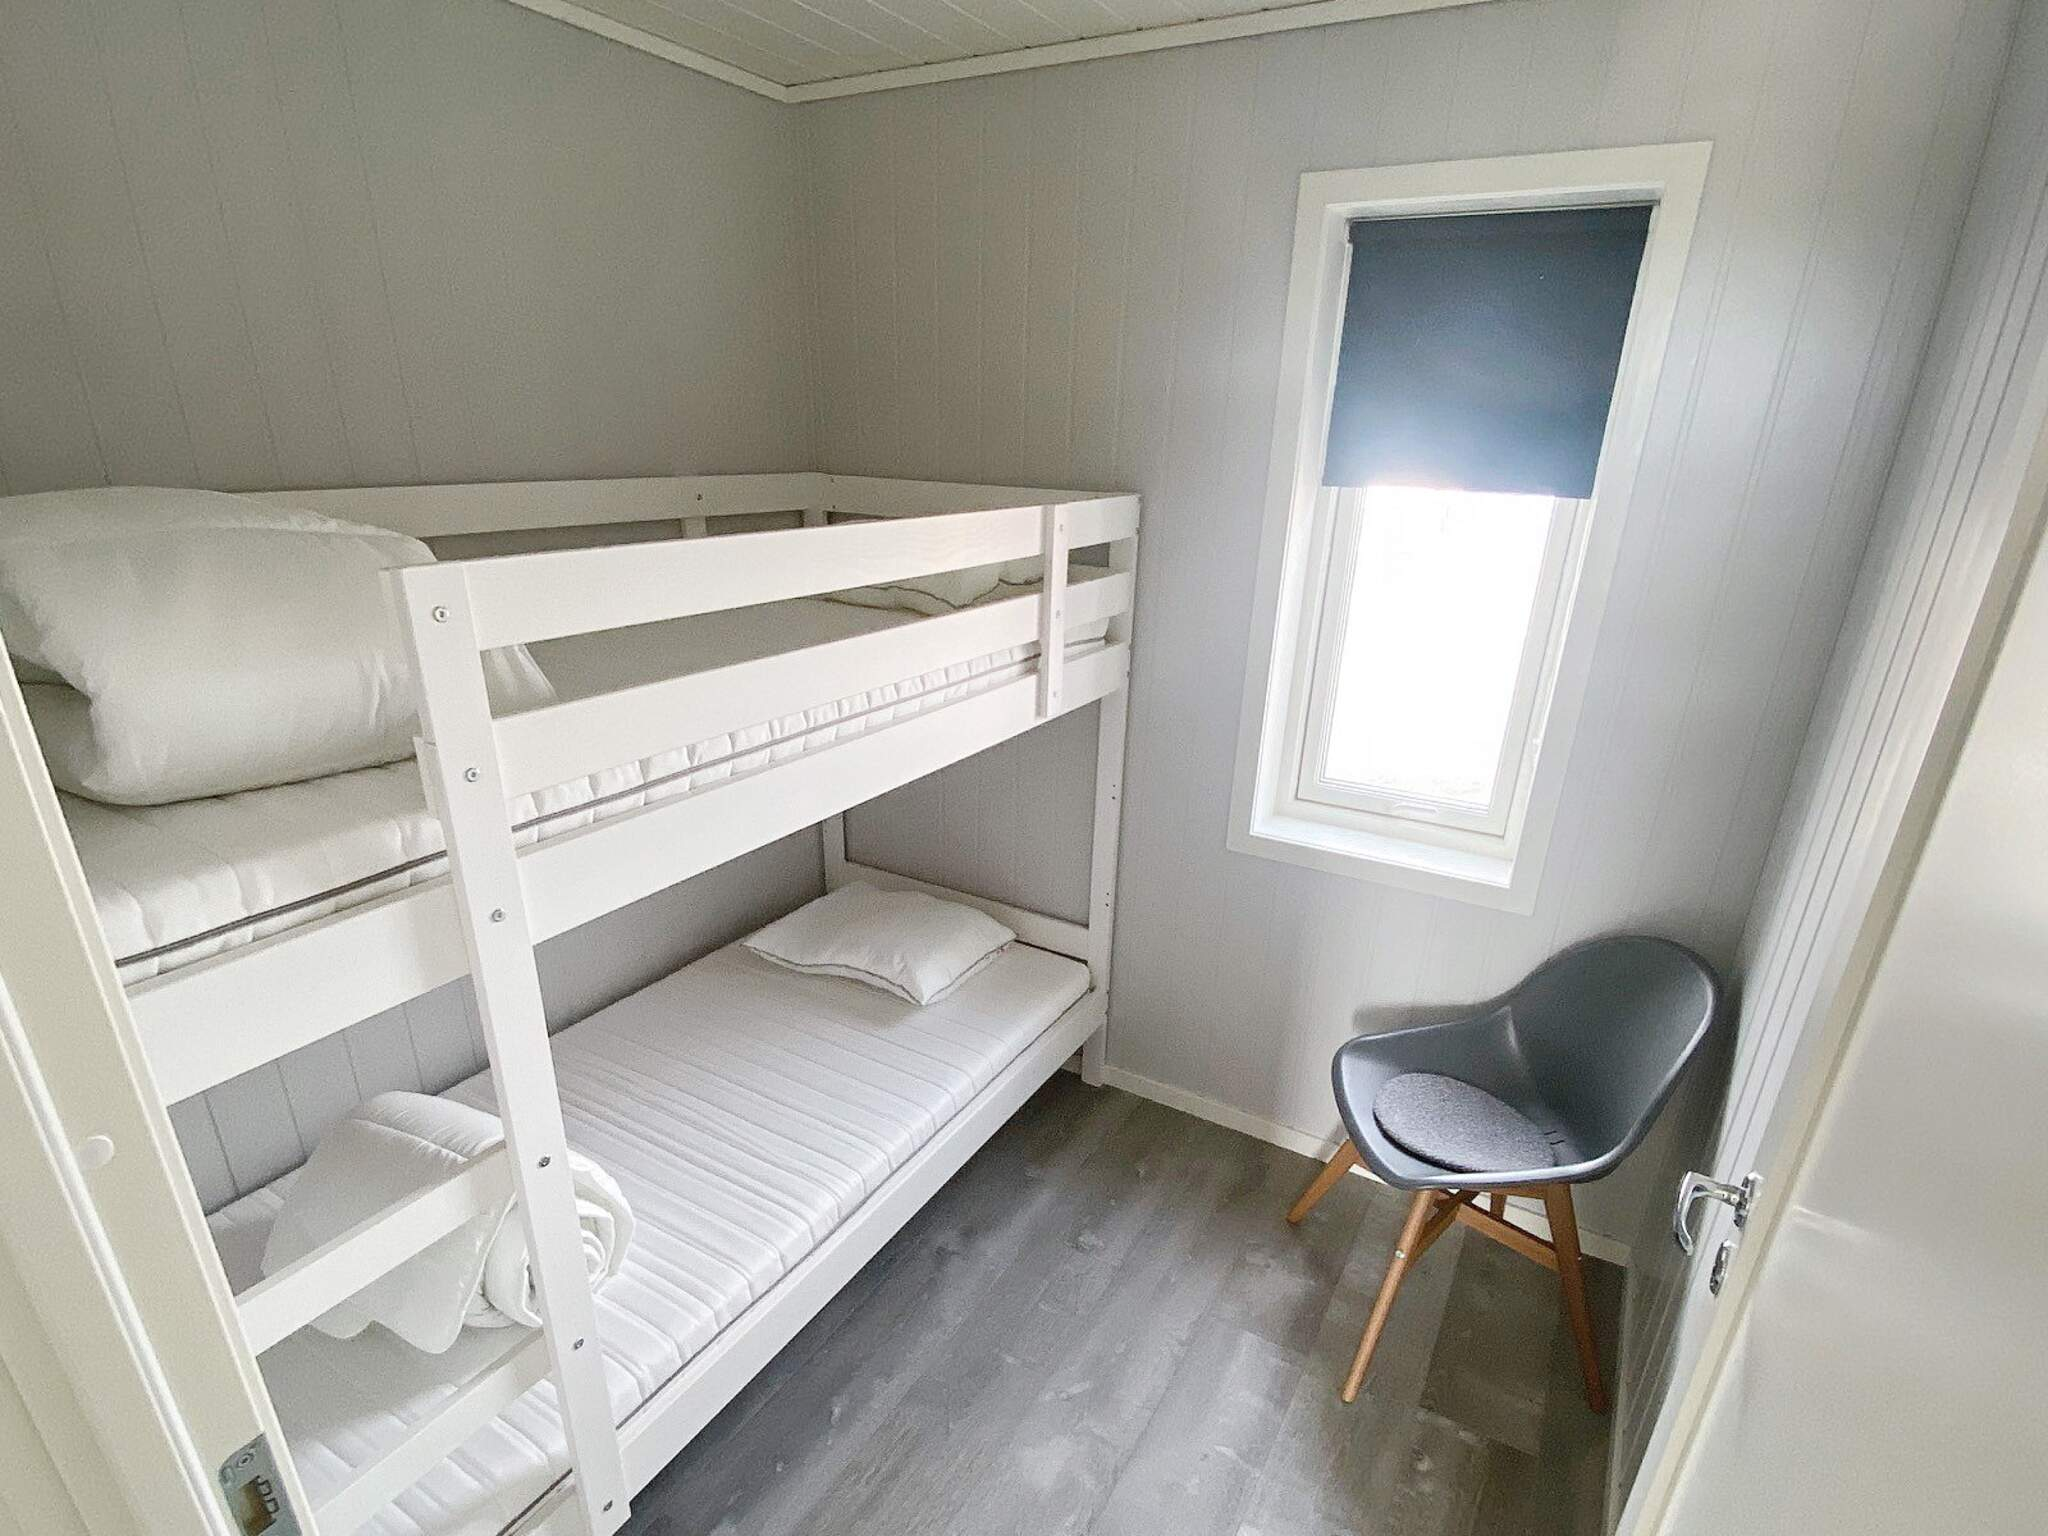 Ferienhaus Sandøy (2789401), Sandøy, More - Romsdal, Westnorwegen, Norwegen, Bild 13